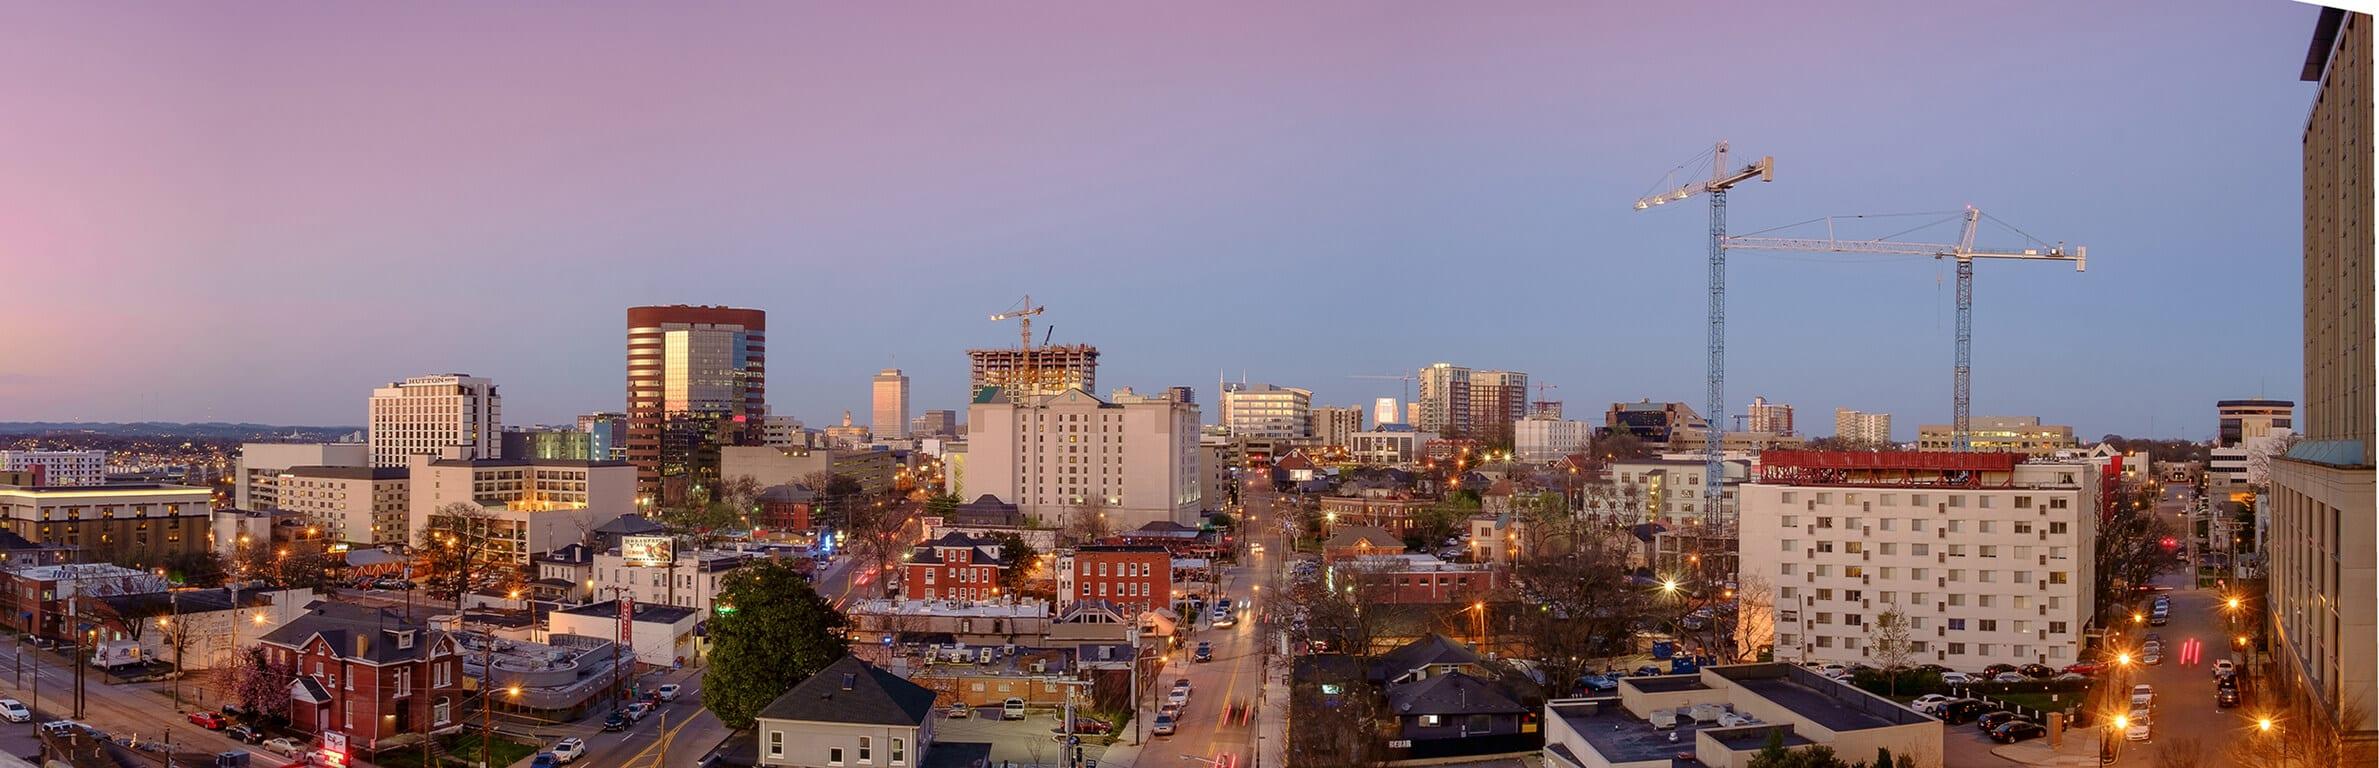 Panoramic View Of City at Aertson Midtown, Nashville, TN, 37203